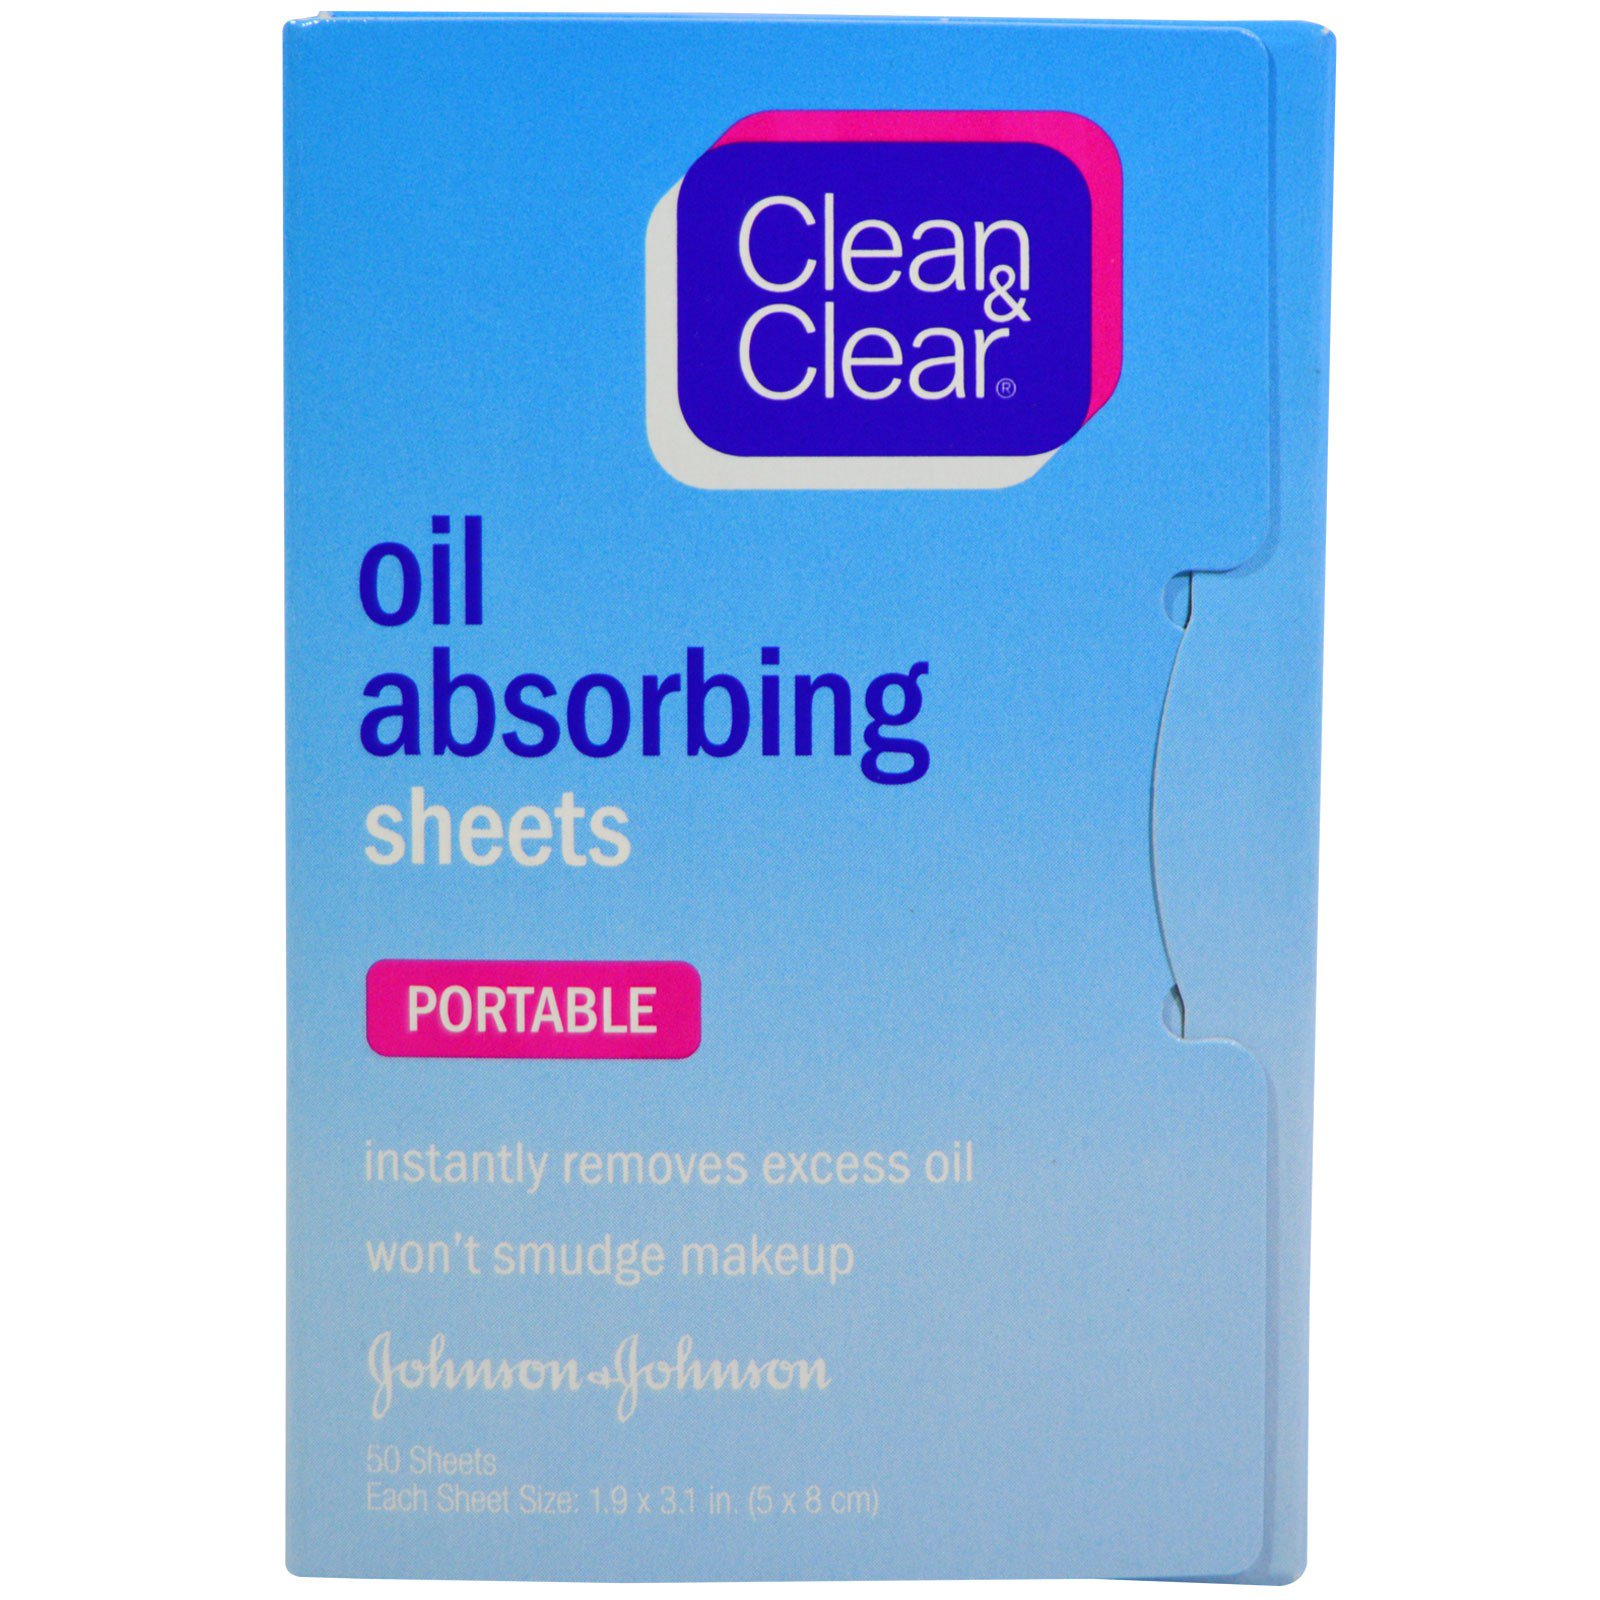 Clean & Clear, Салфетки, впитывающие масло, дорожные, 50 салфеток